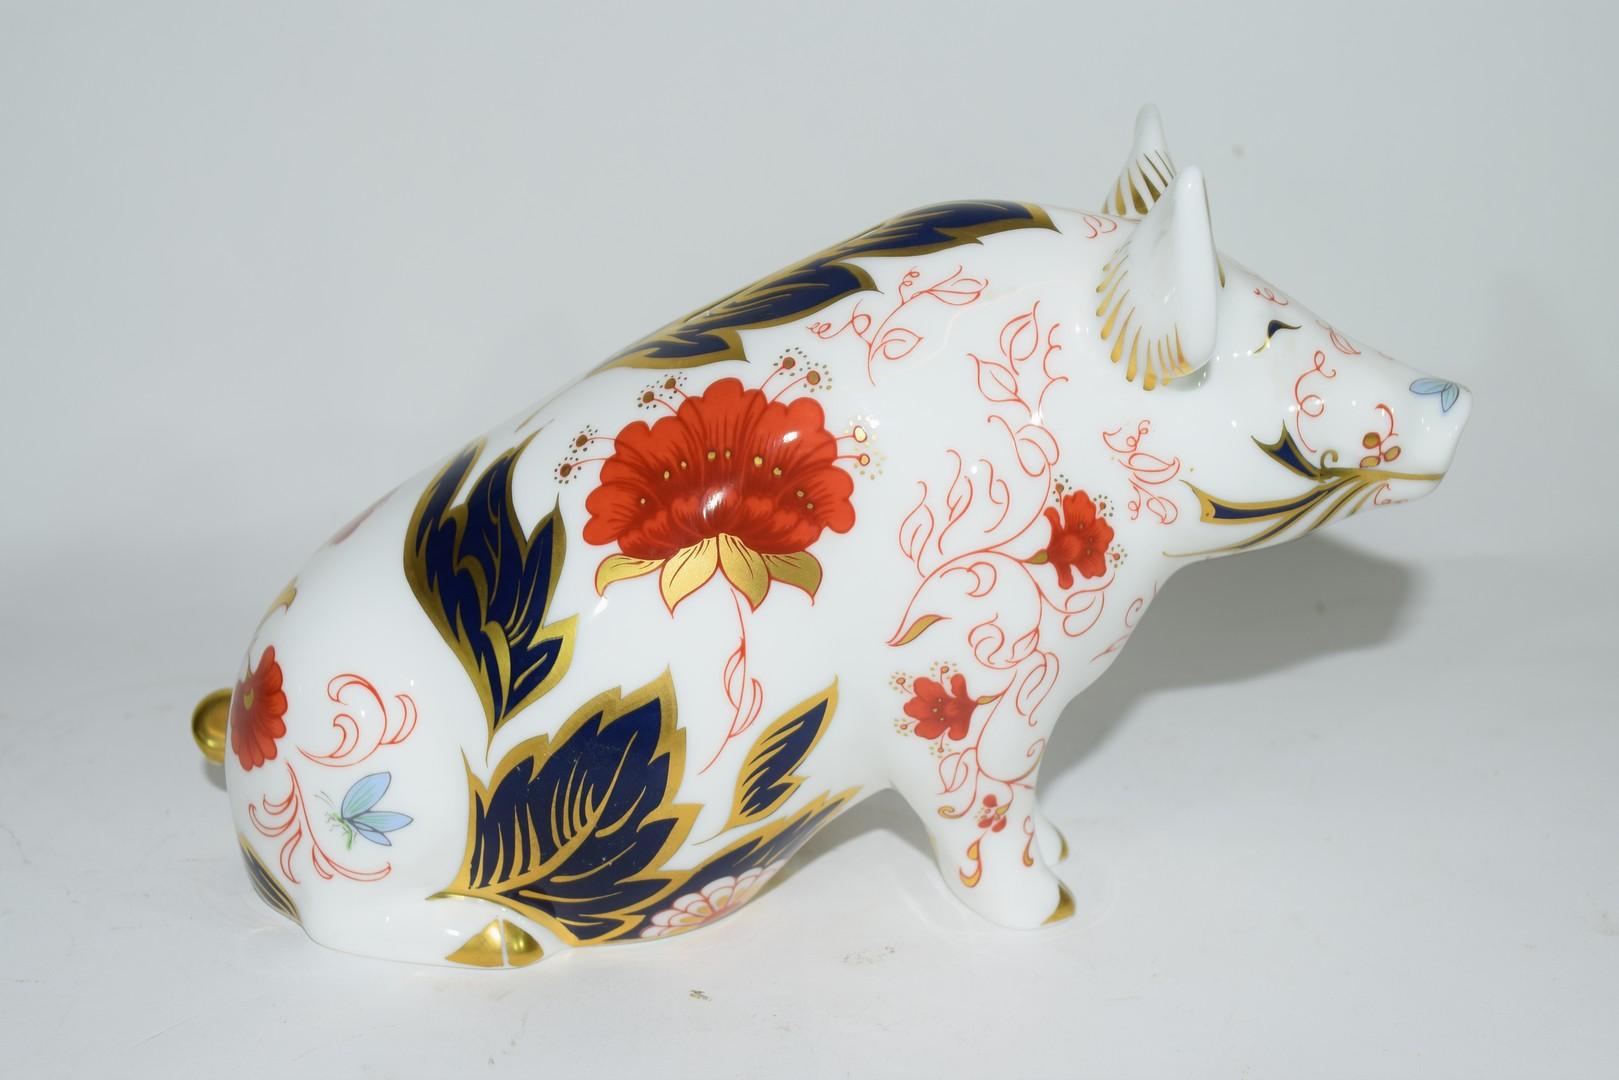 Large Royal Crown Derby pig money box - Image 3 of 5